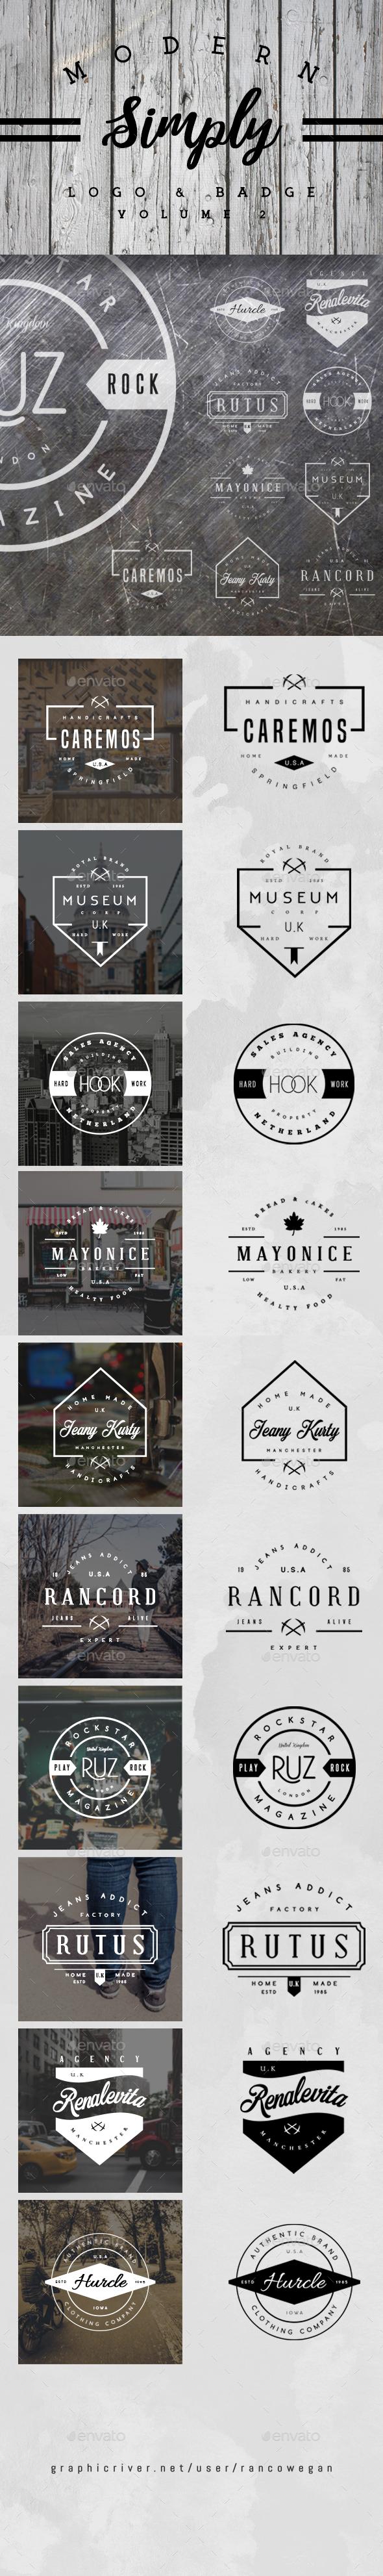 Vintage Logo & Badge Vol. 2 - Badges & Stickers Web Elements